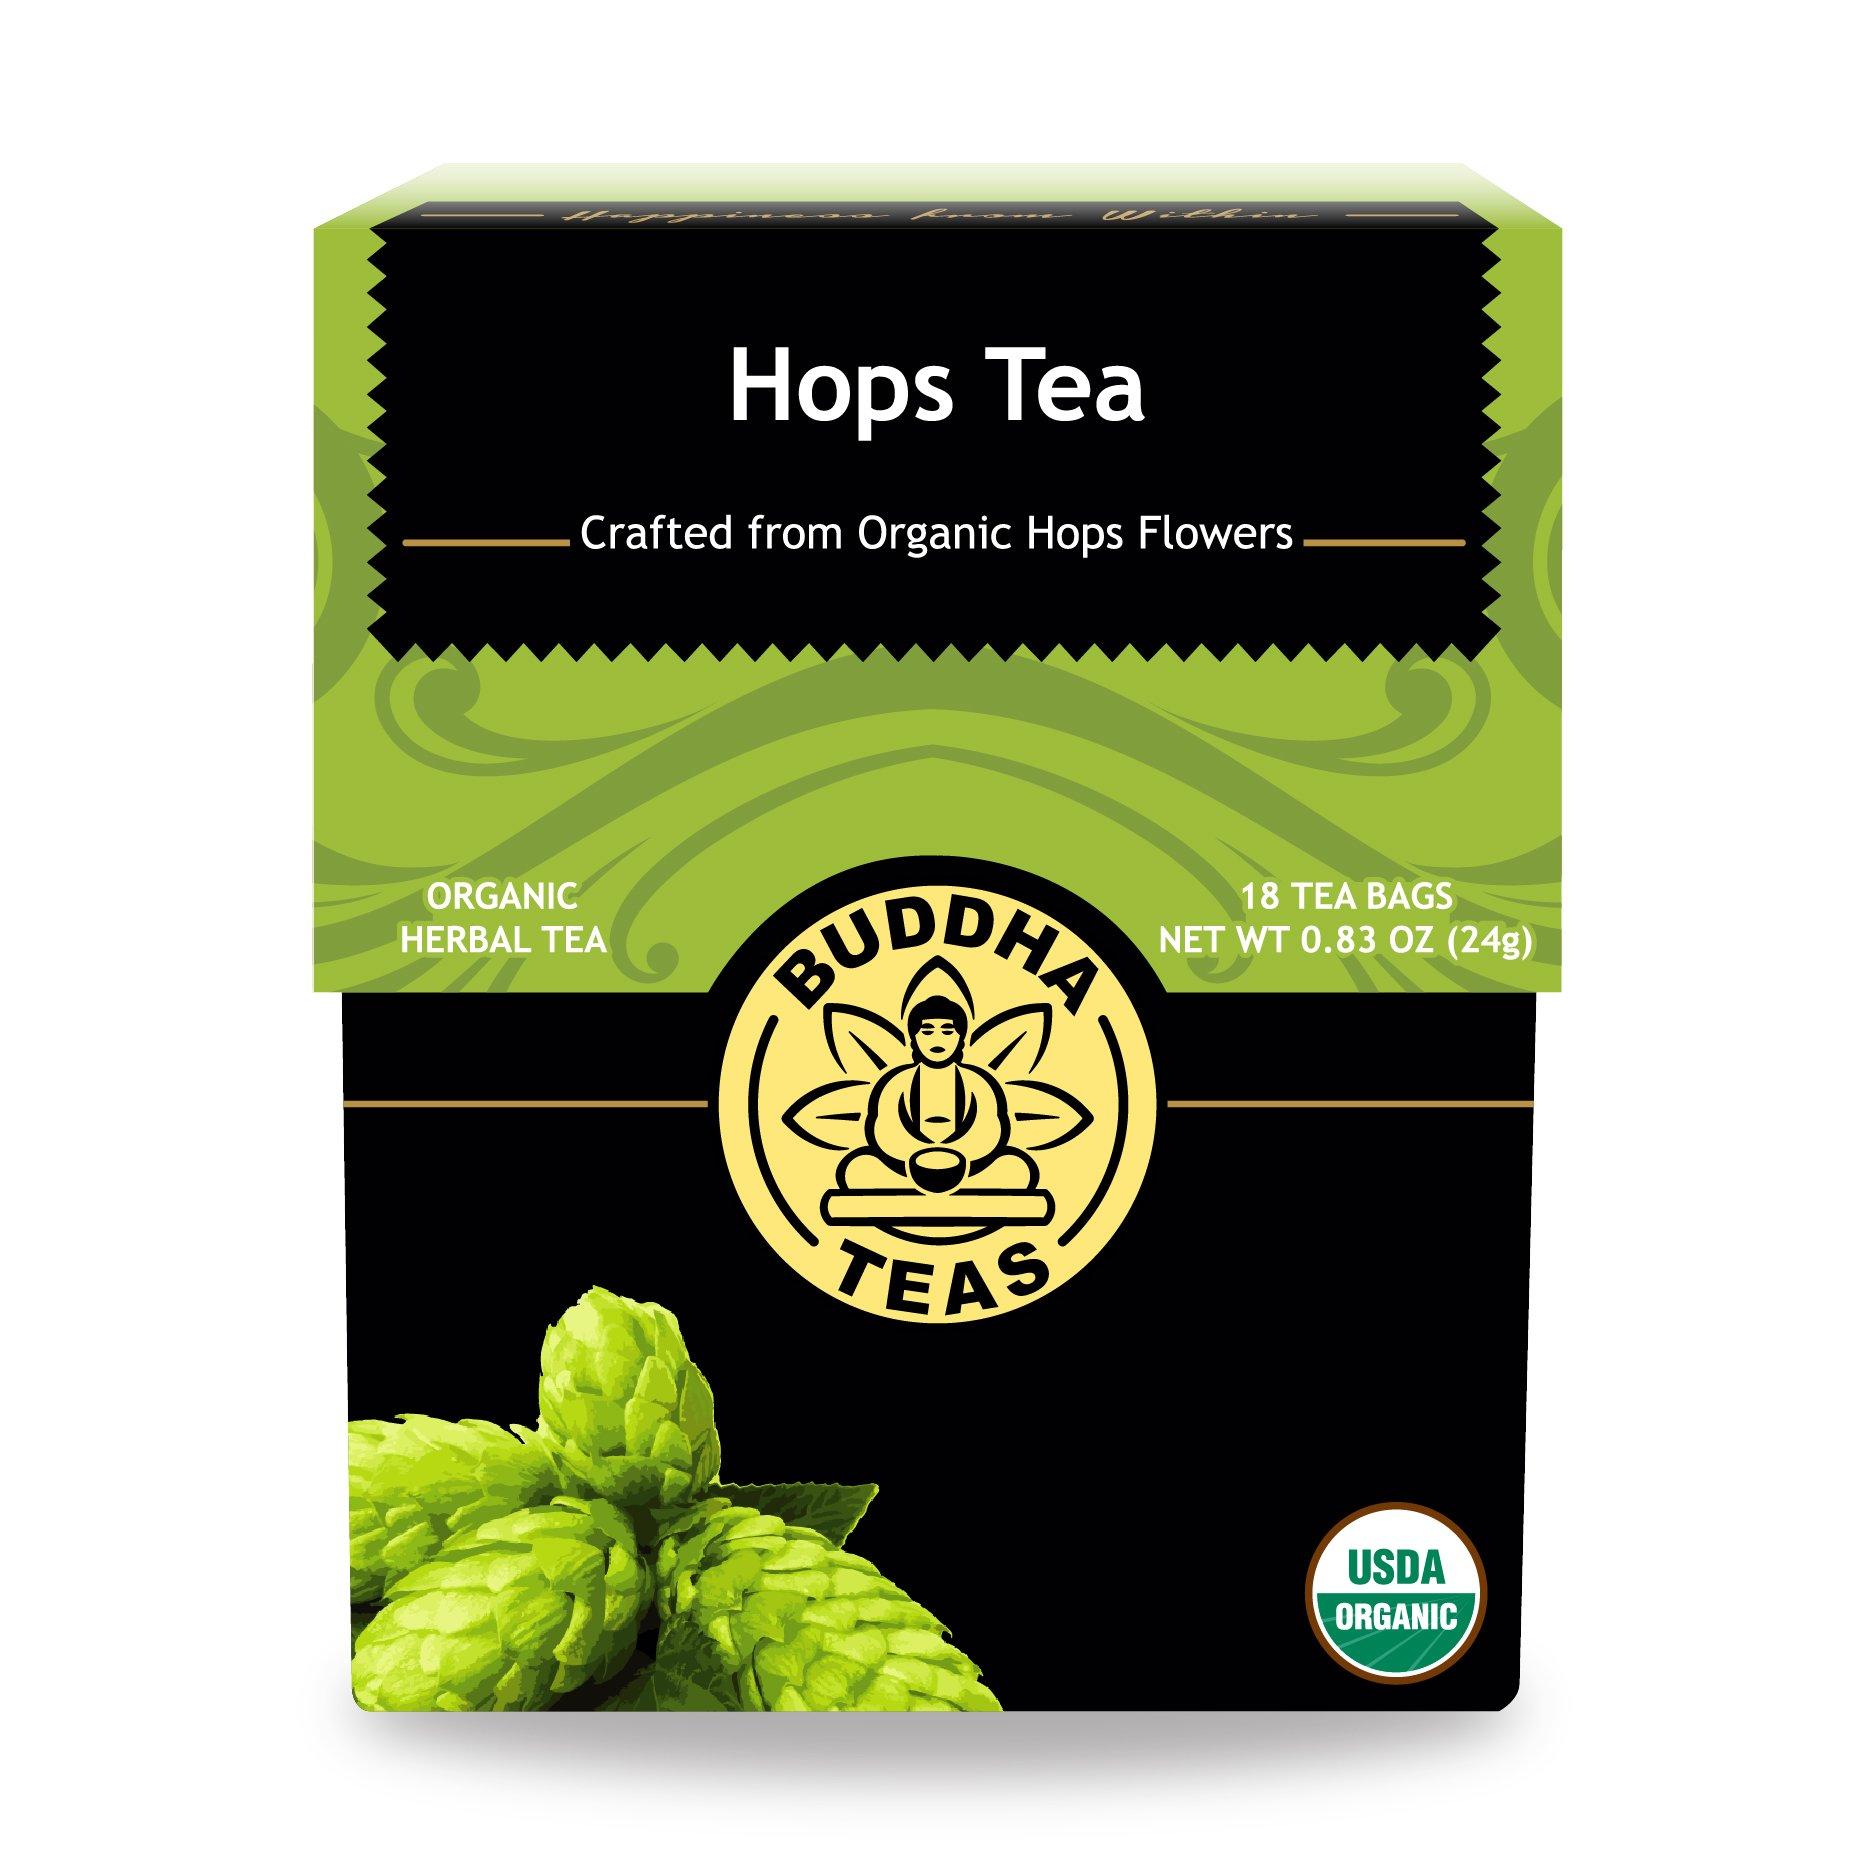 Cheapest amazon herbs - Organic Hops Tea Kosher Caffeine Free Gmo Free 18 Bleach Free